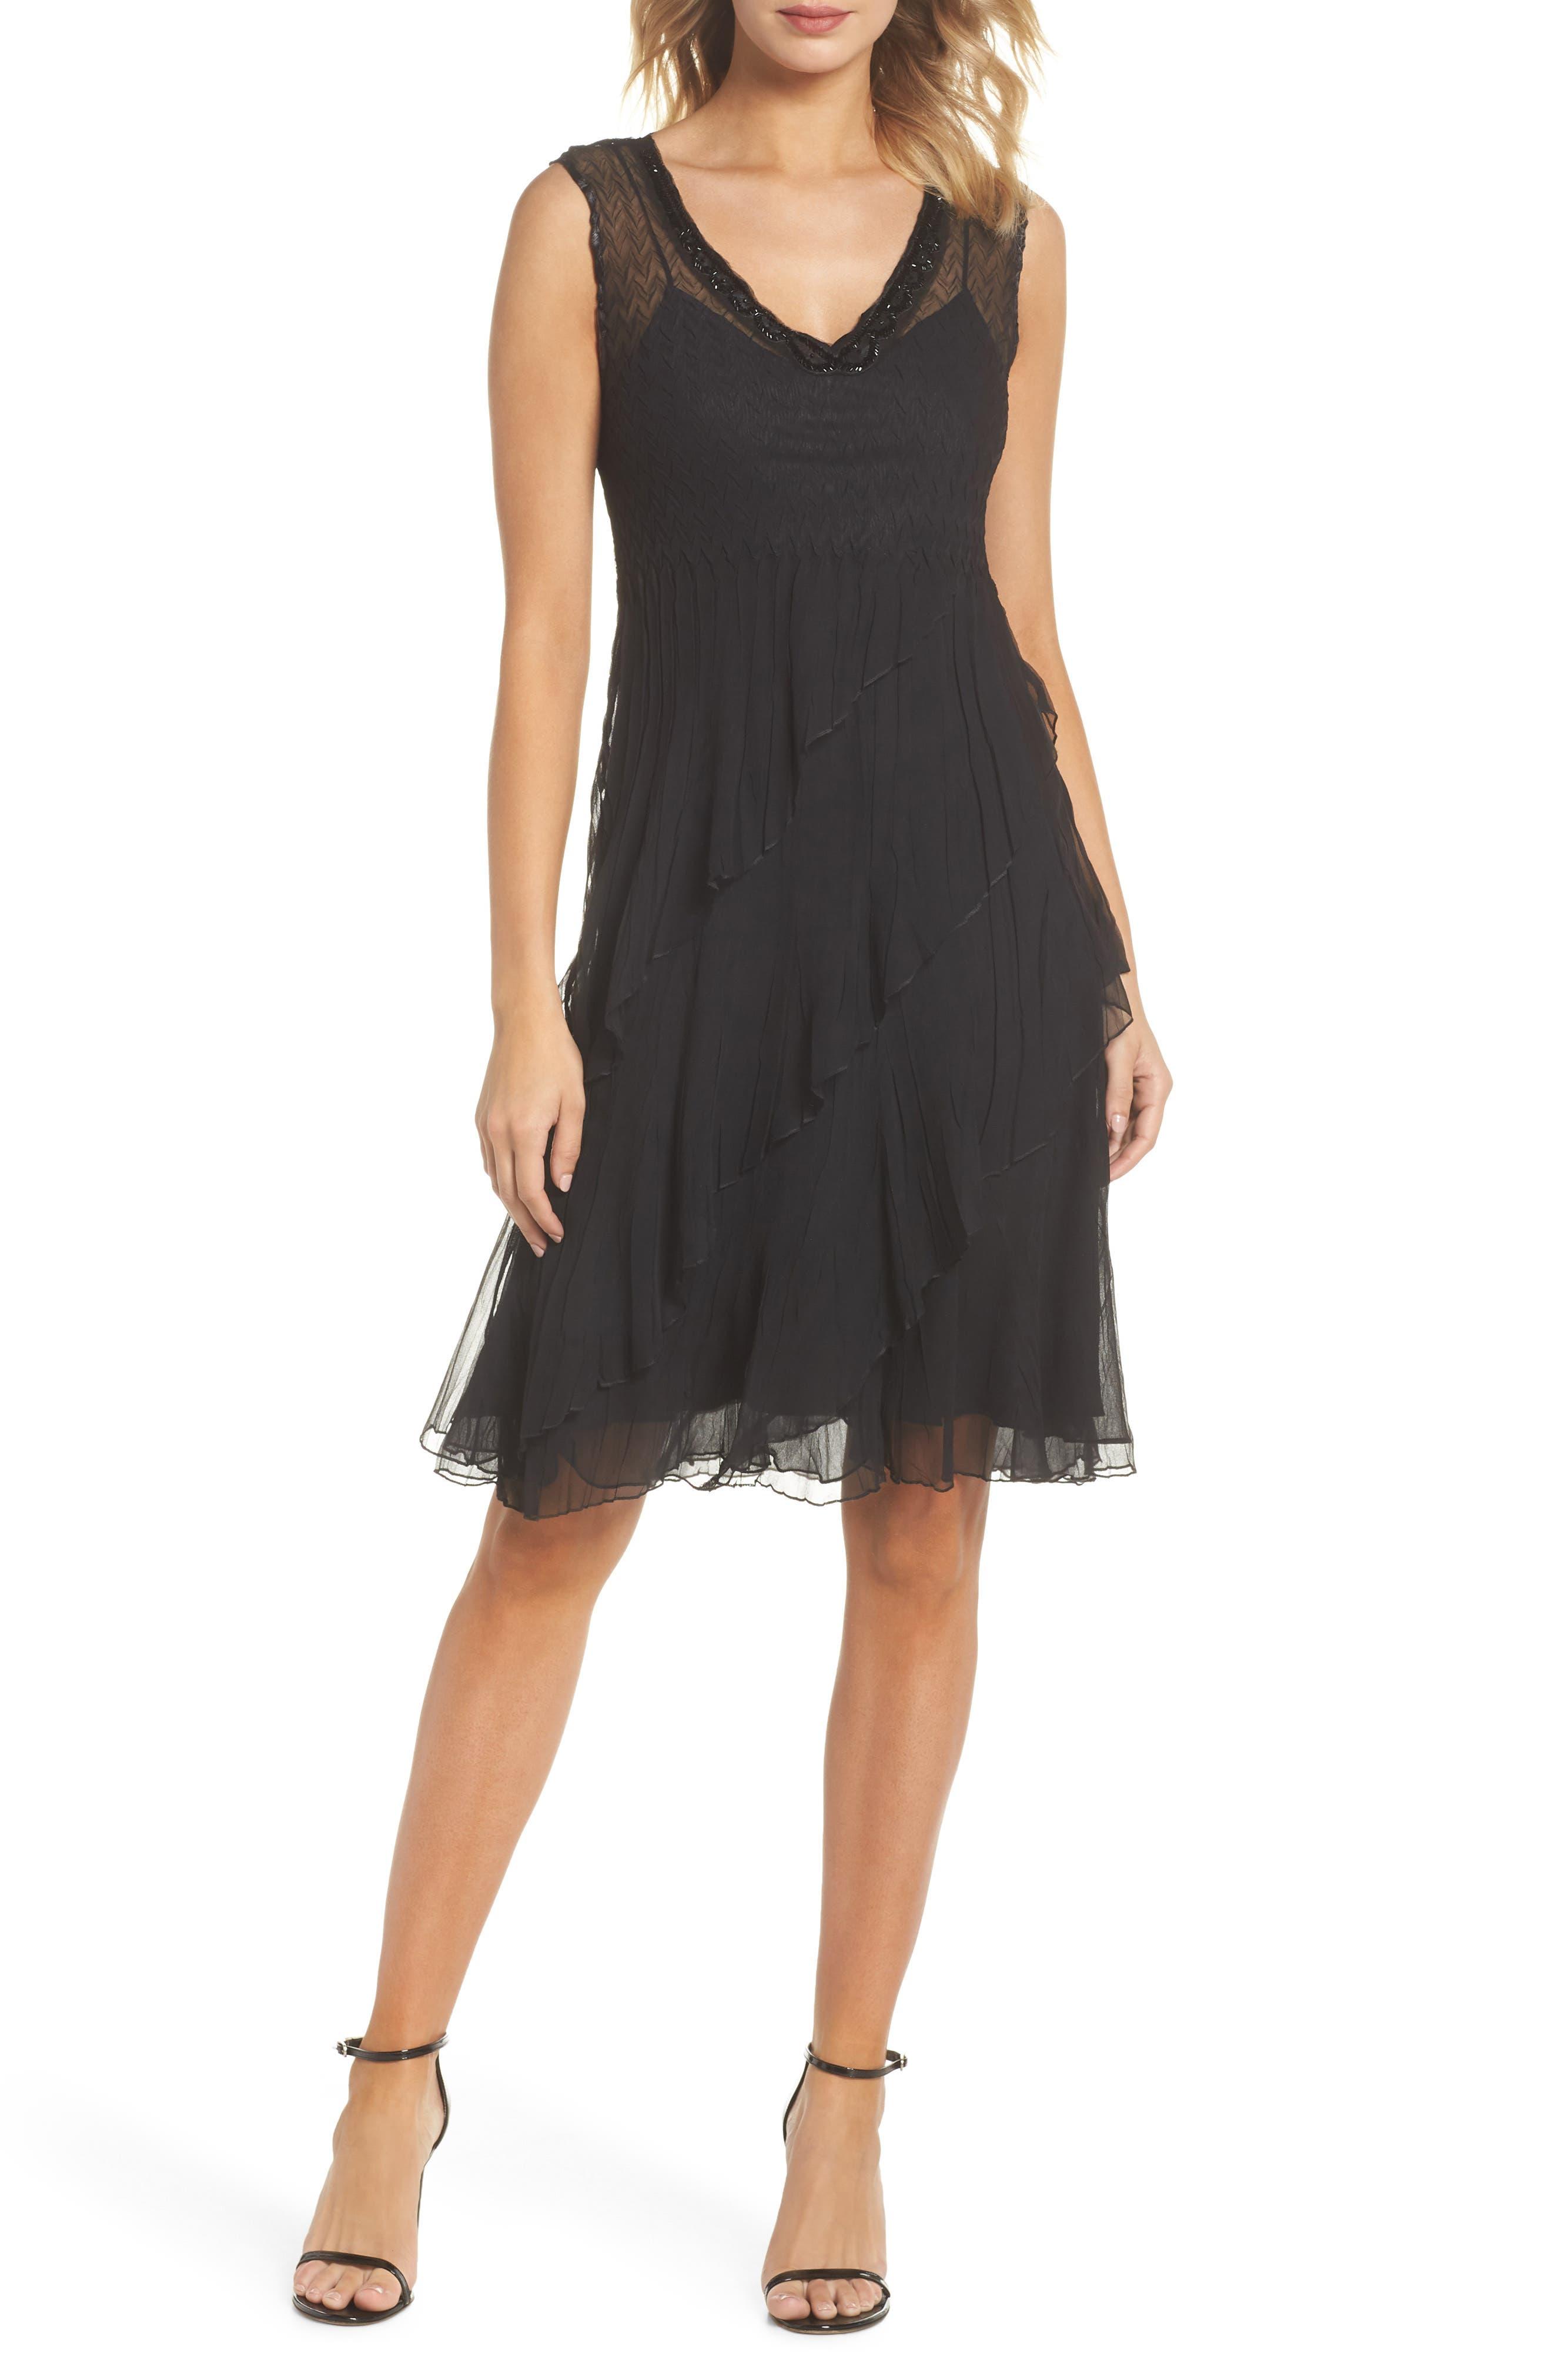 KOMAROV, Bead Trim Chiffon Dress with Wrap, Alternate thumbnail 5, color, BLACK